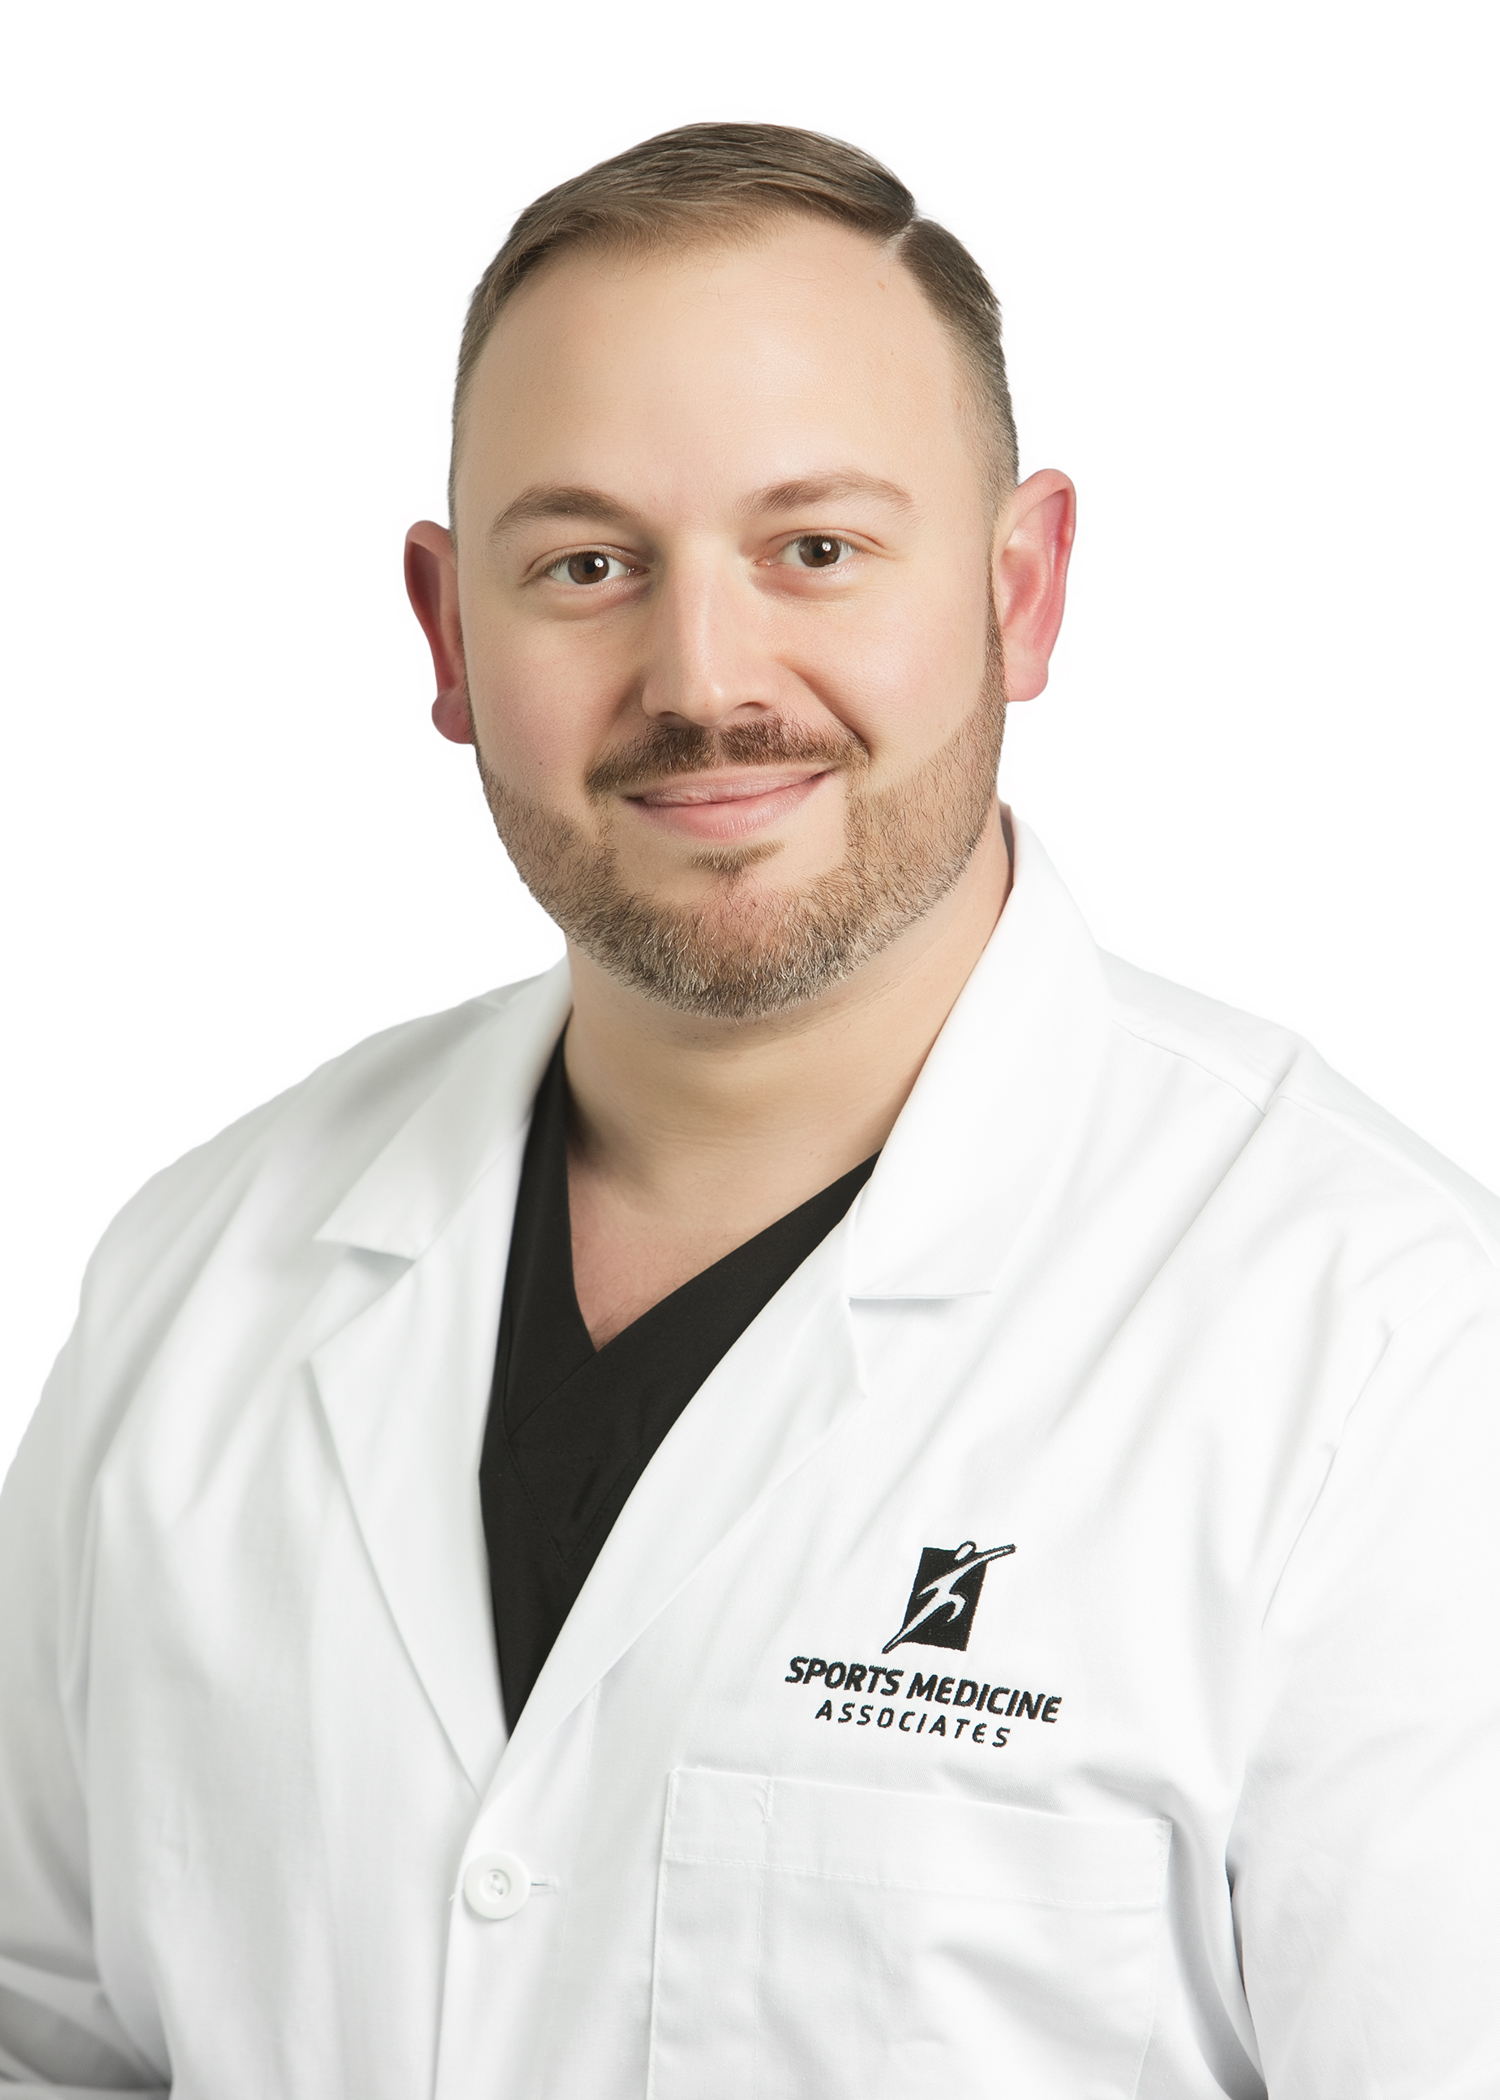 Geoffrey Glebus, D.O. - Board Certified Orthopedic Surgeon